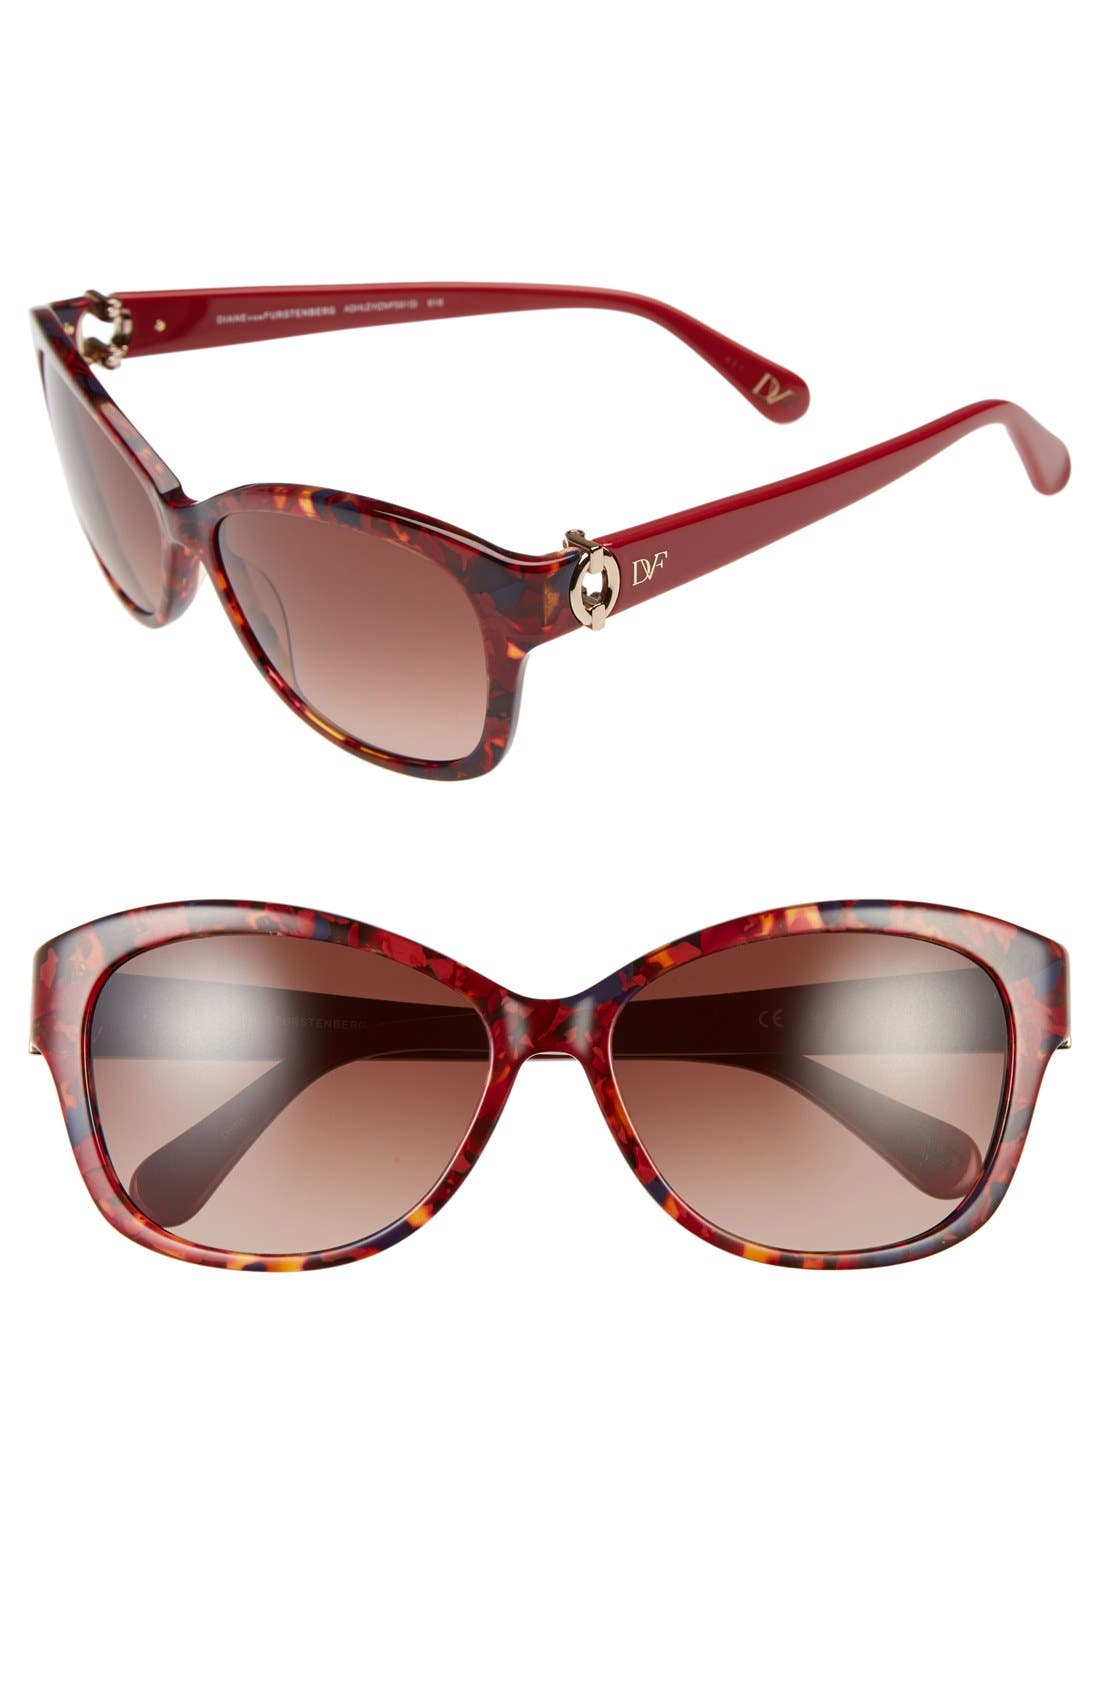 Alternate Image 1 Selected - Diane von Furstenberg 'Ashley' 58mm Sunglasses